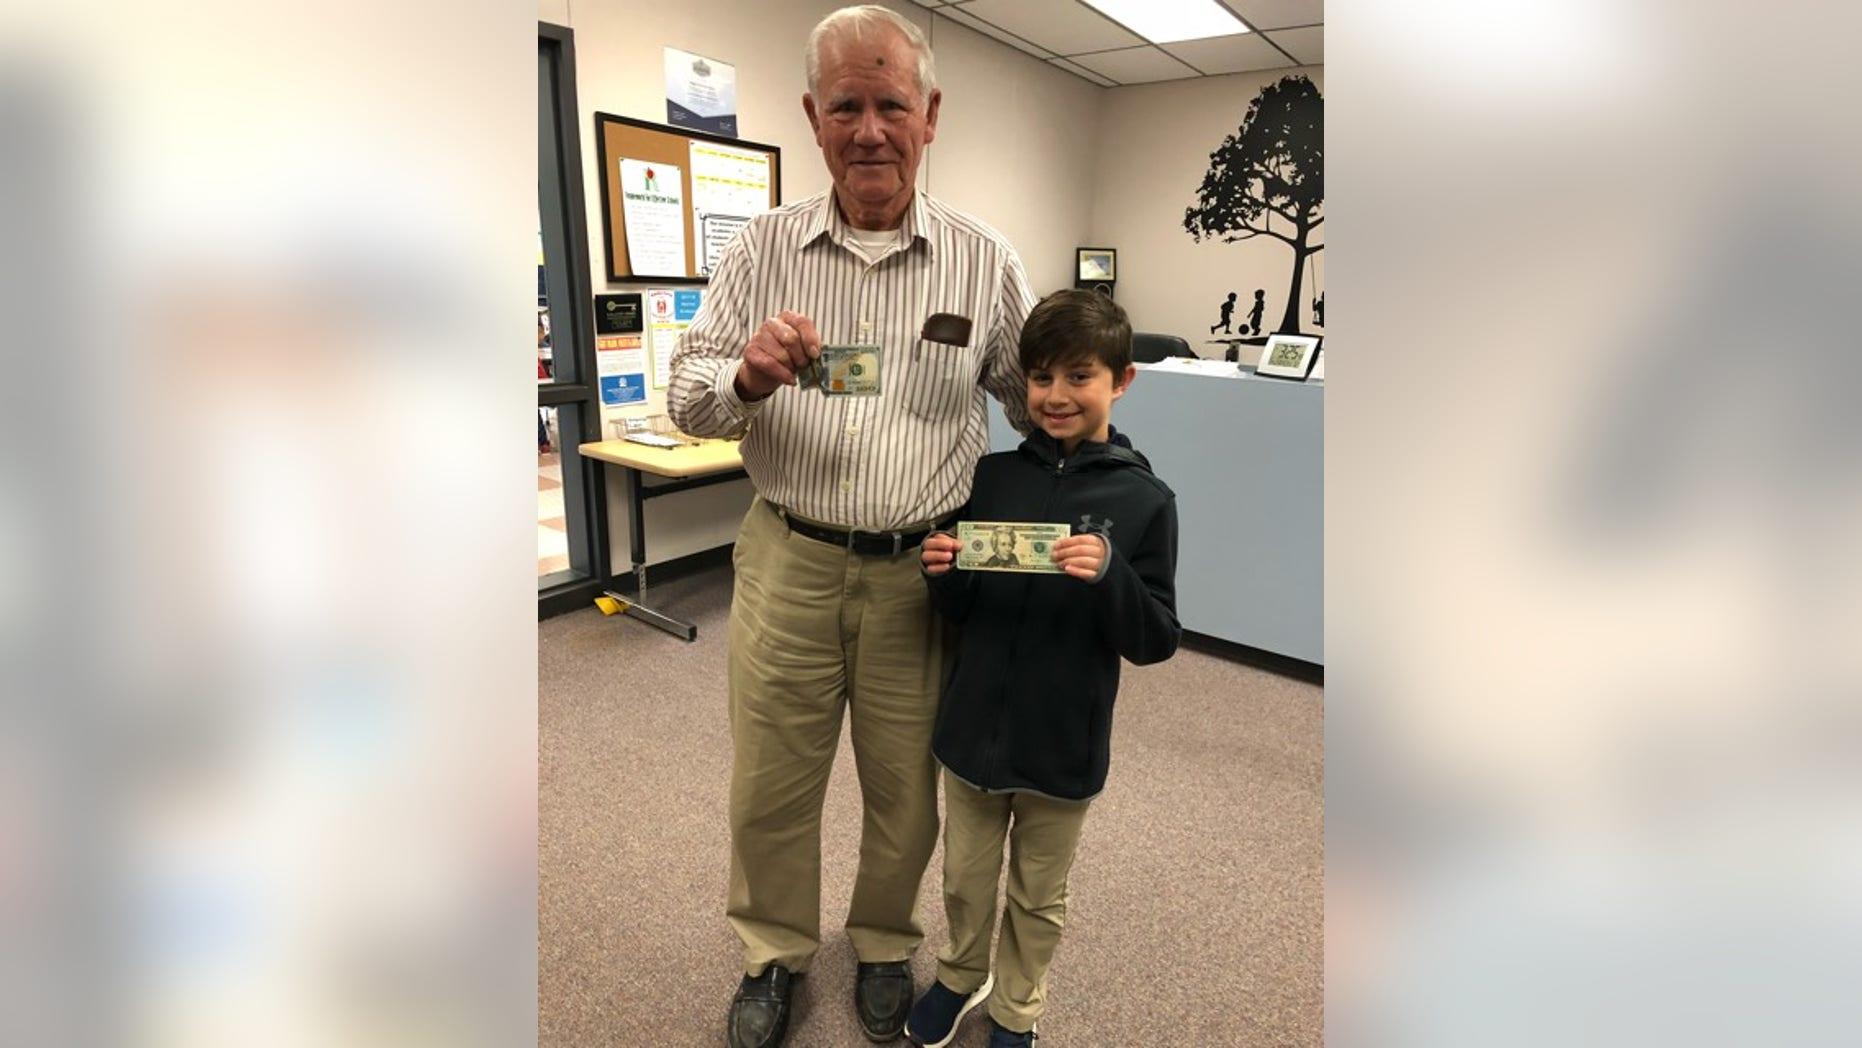 Jaron returned the man's $100 bill on Monday.